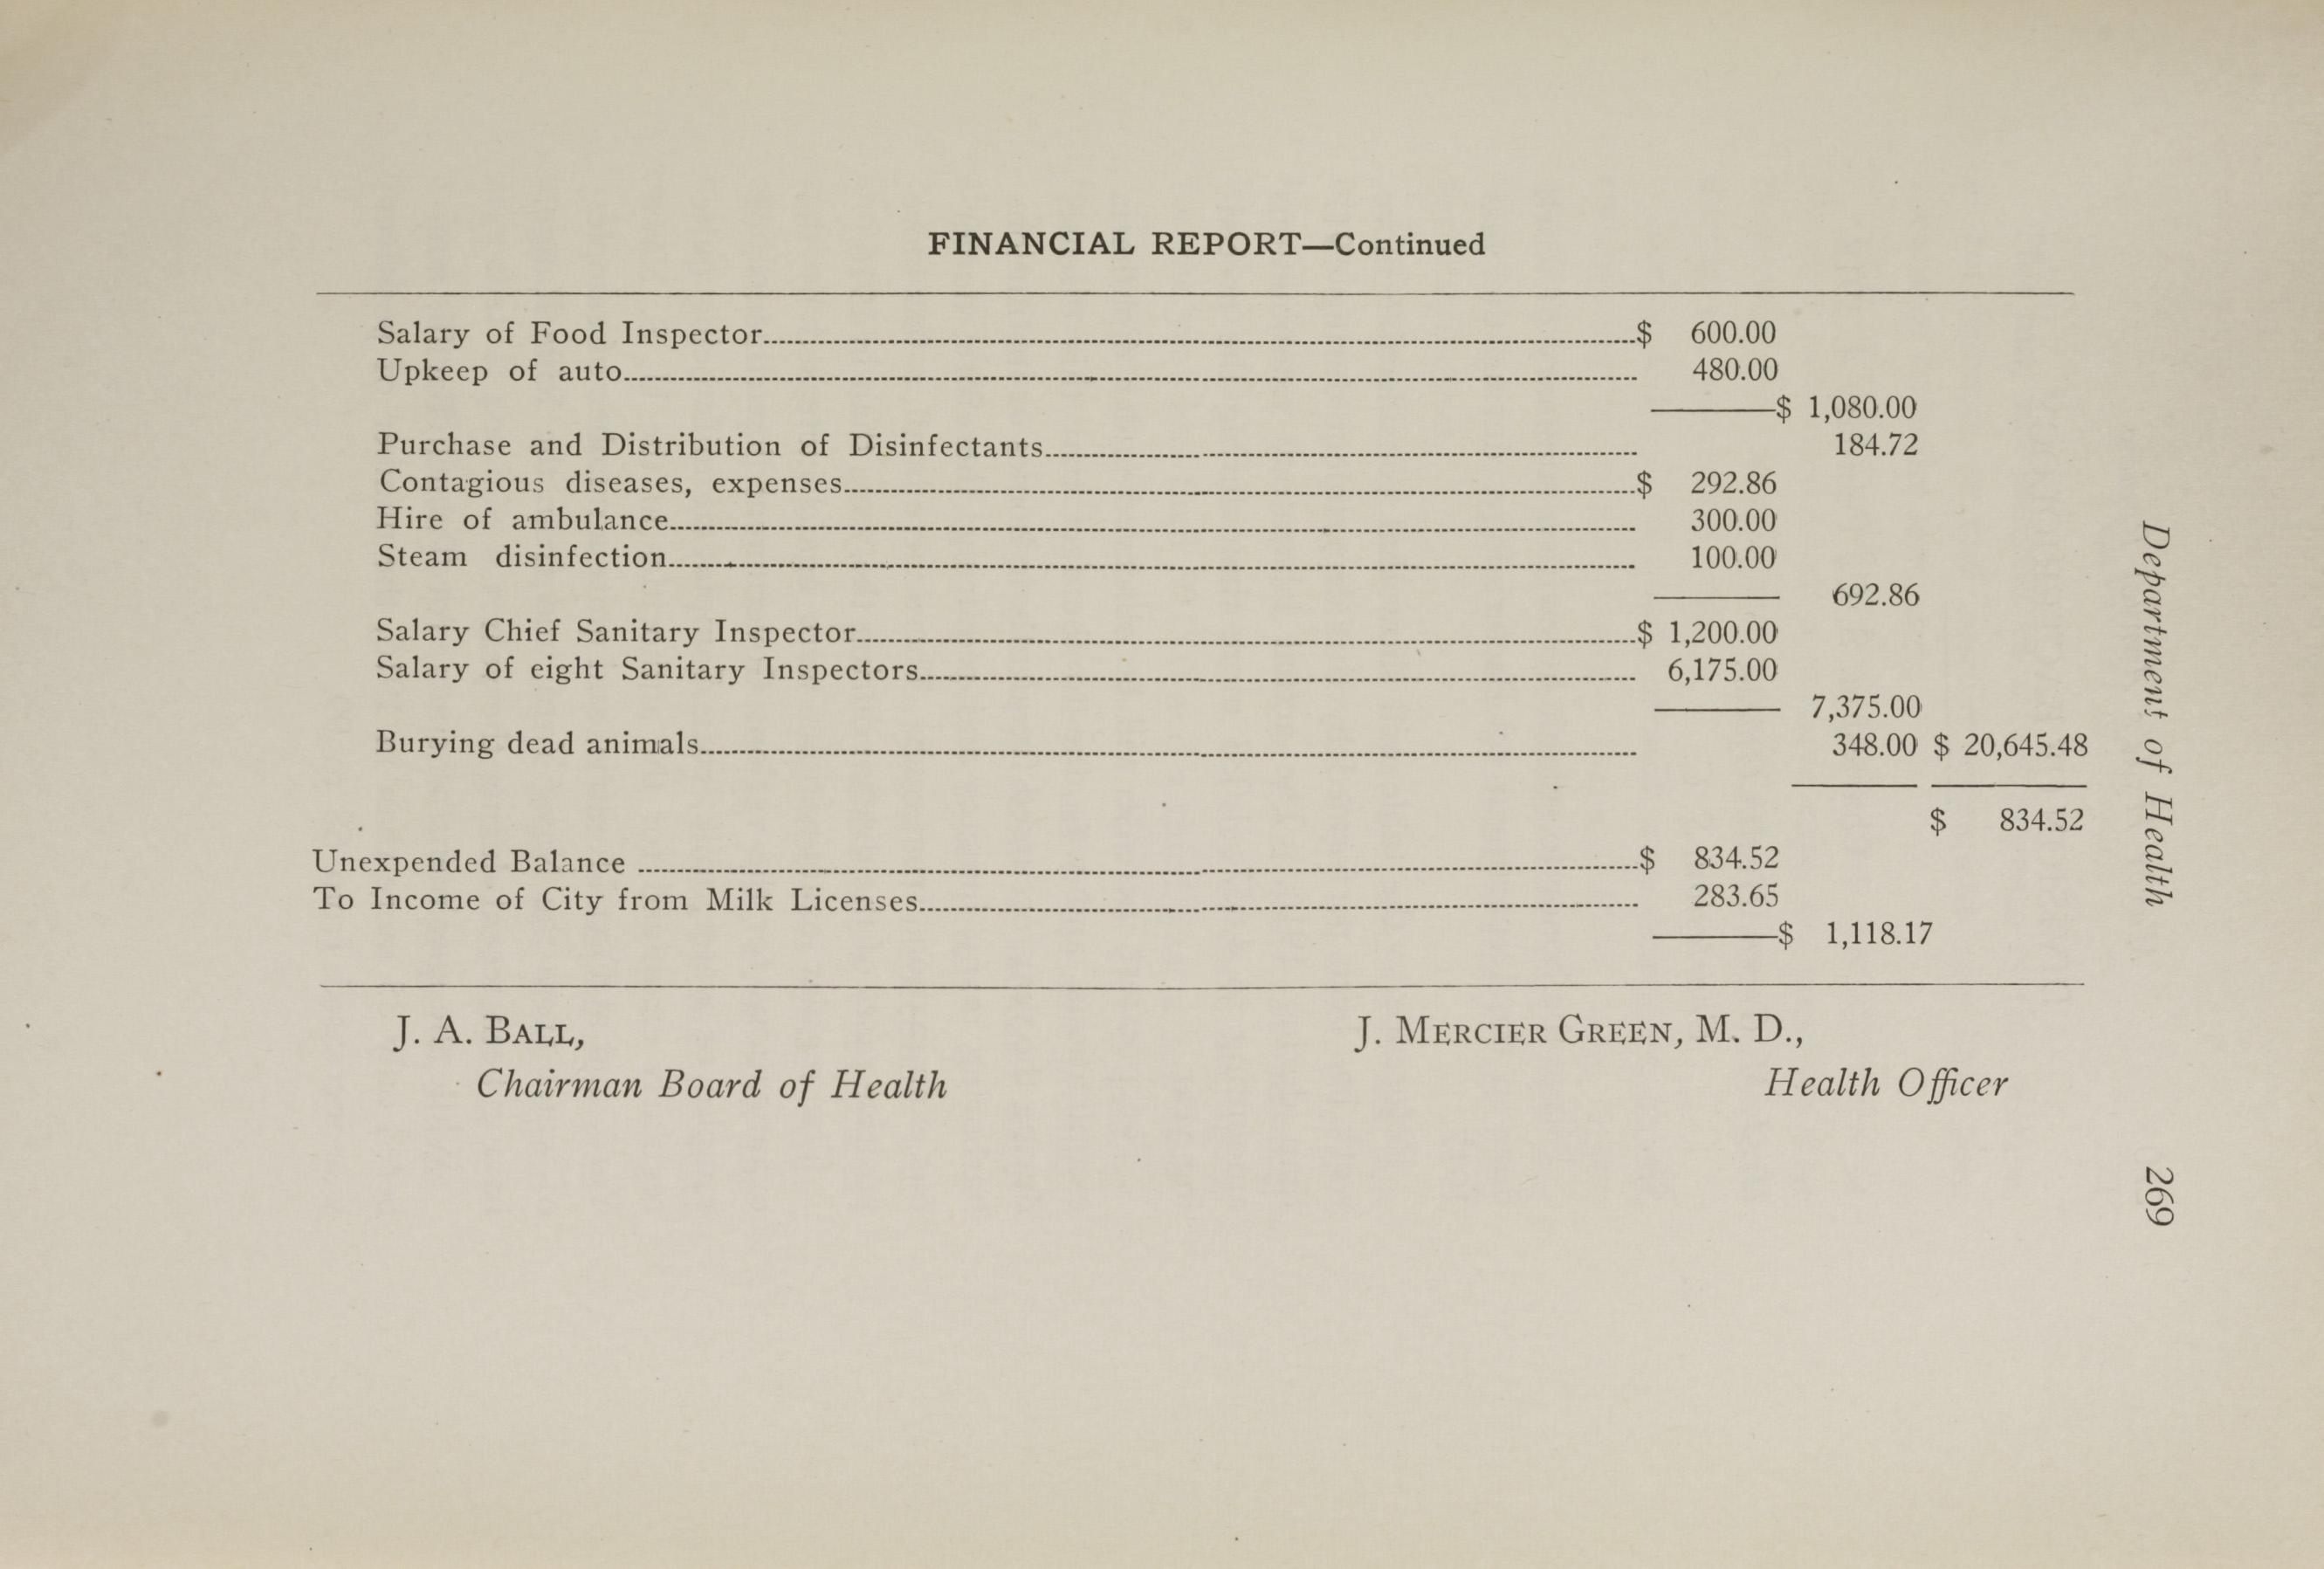 Charleston Yearbook, 1917, page 269